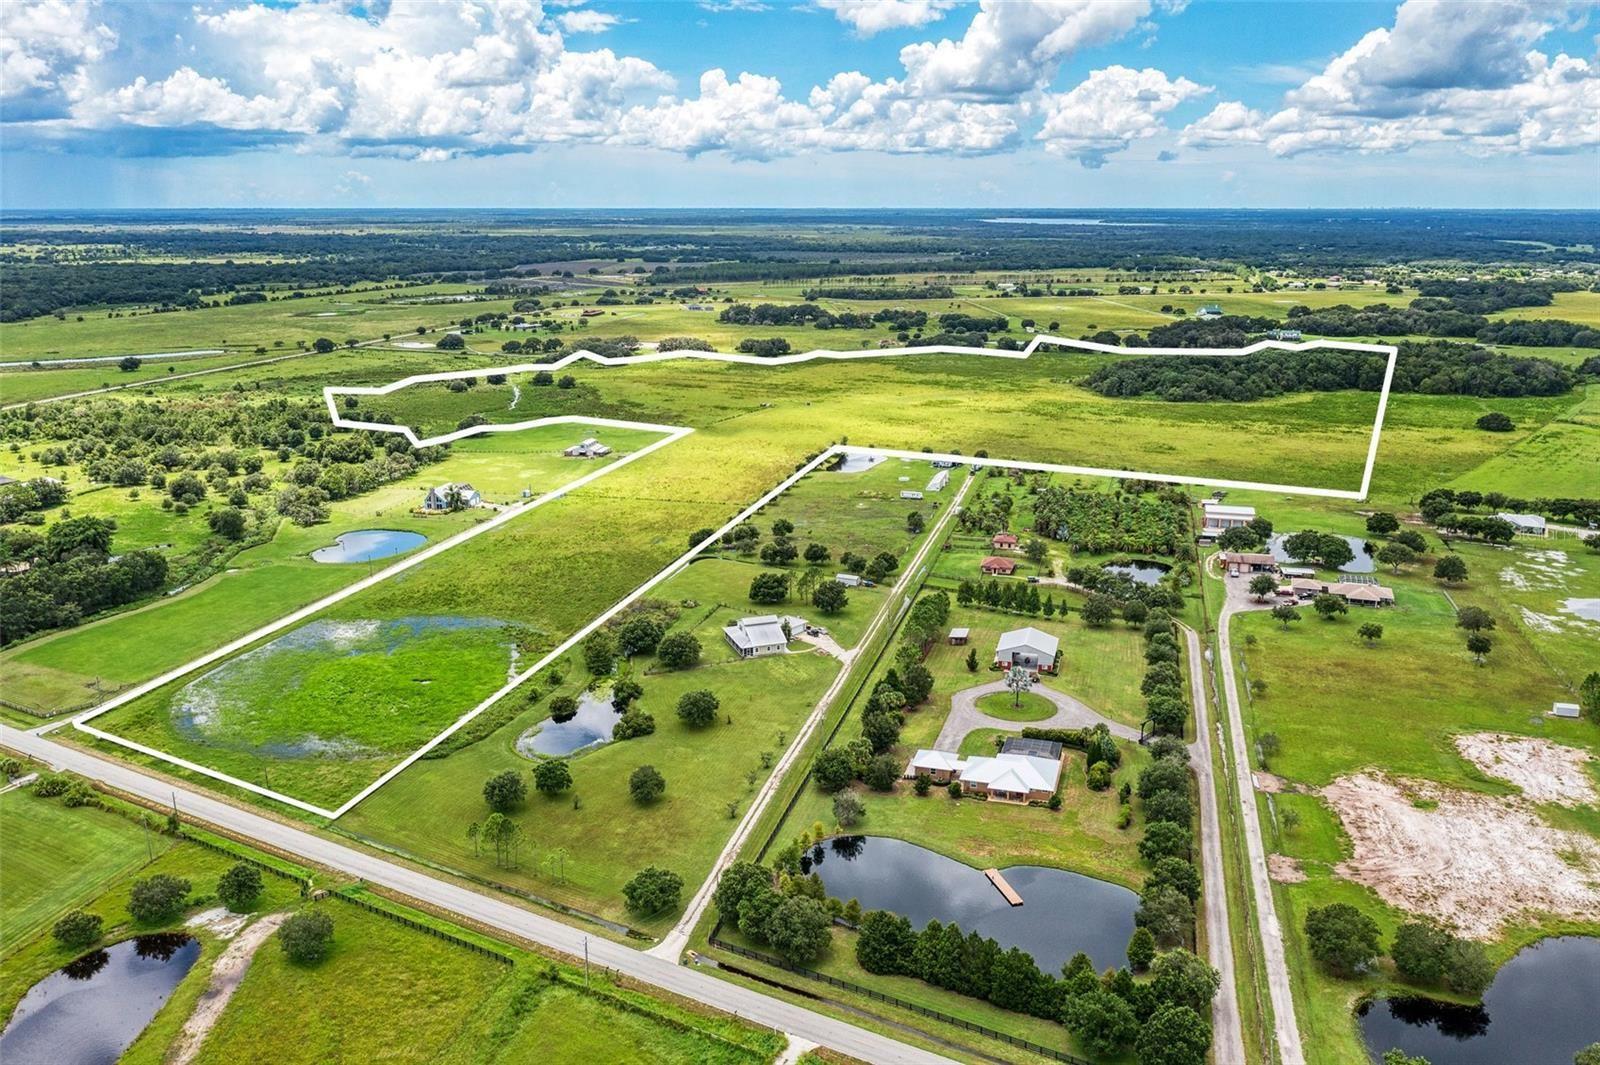 Photo of 14450 MJ ROAD, MYAKKA CITY, FL 34251 (MLS # A4509416)